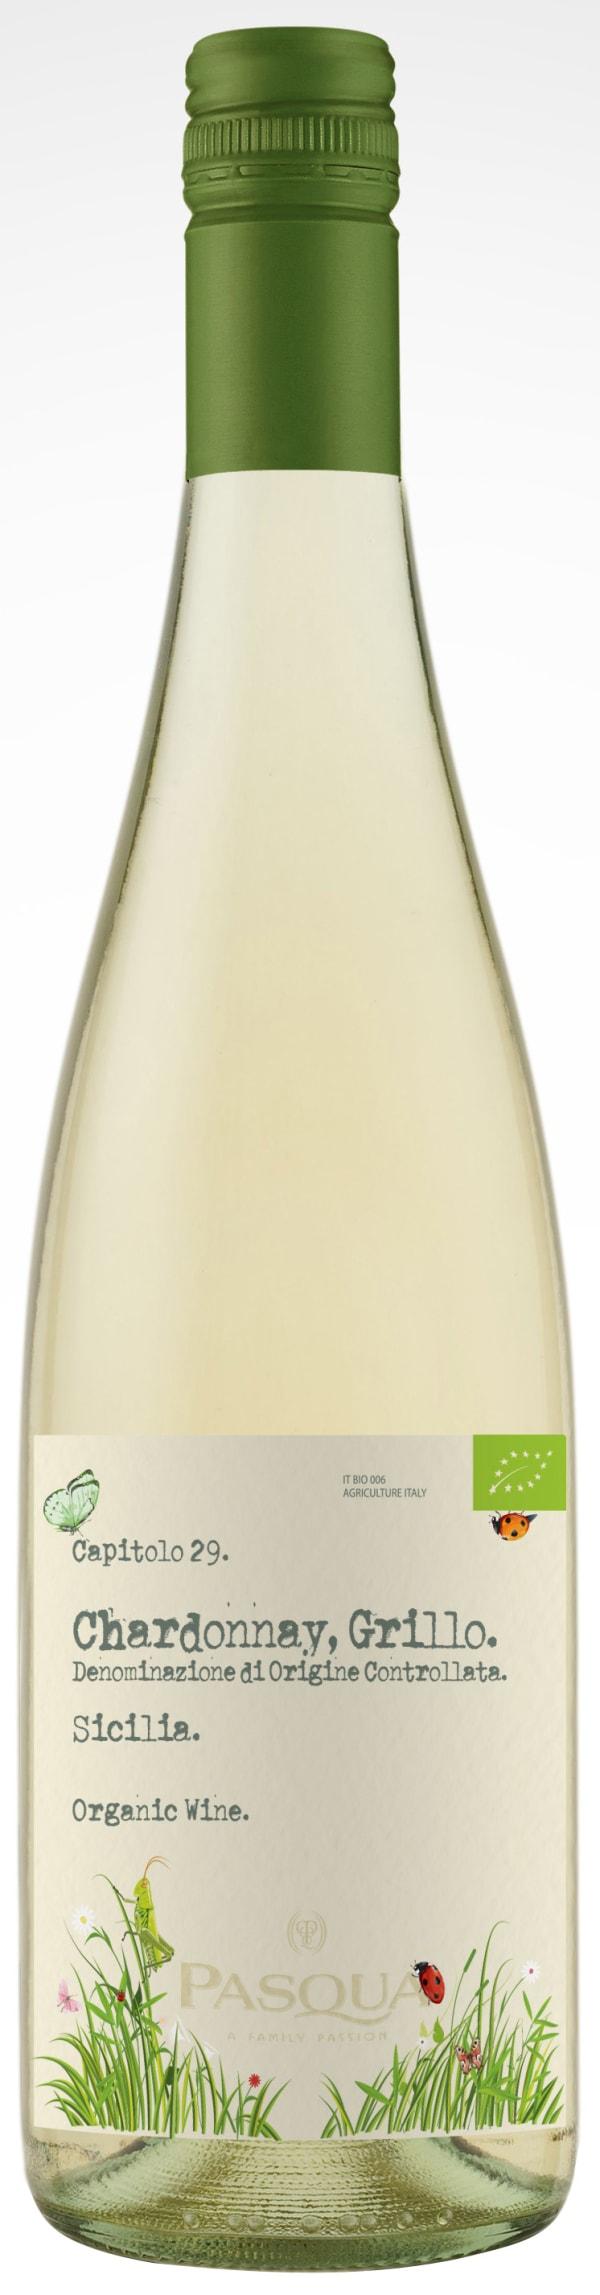 Pasqua Chardonnay Grillo Organic 2016